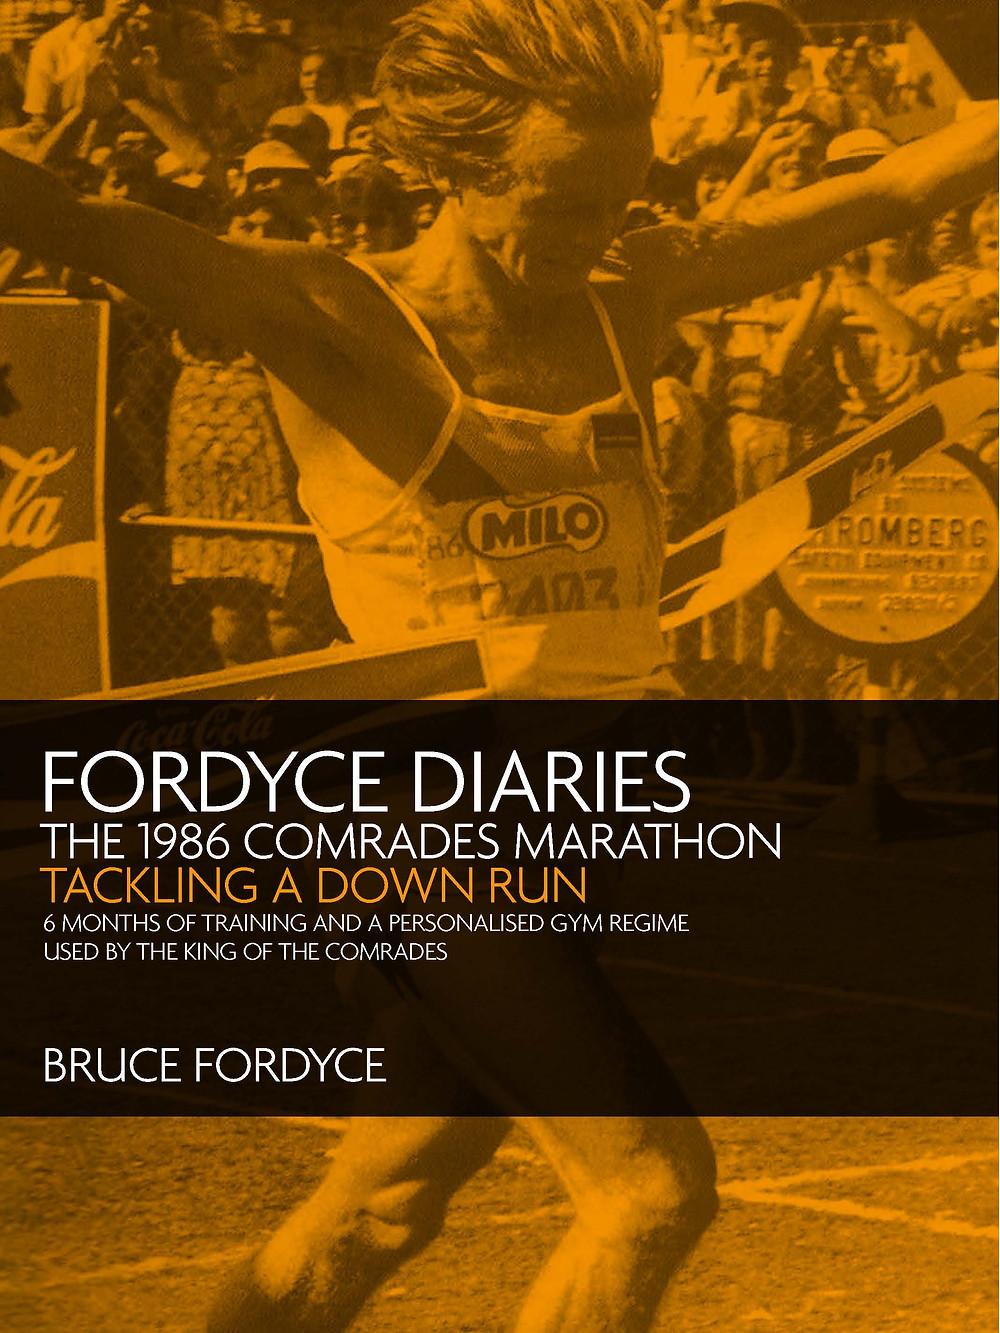 Bruce Fordyce Diaries, Tackling a Down Run